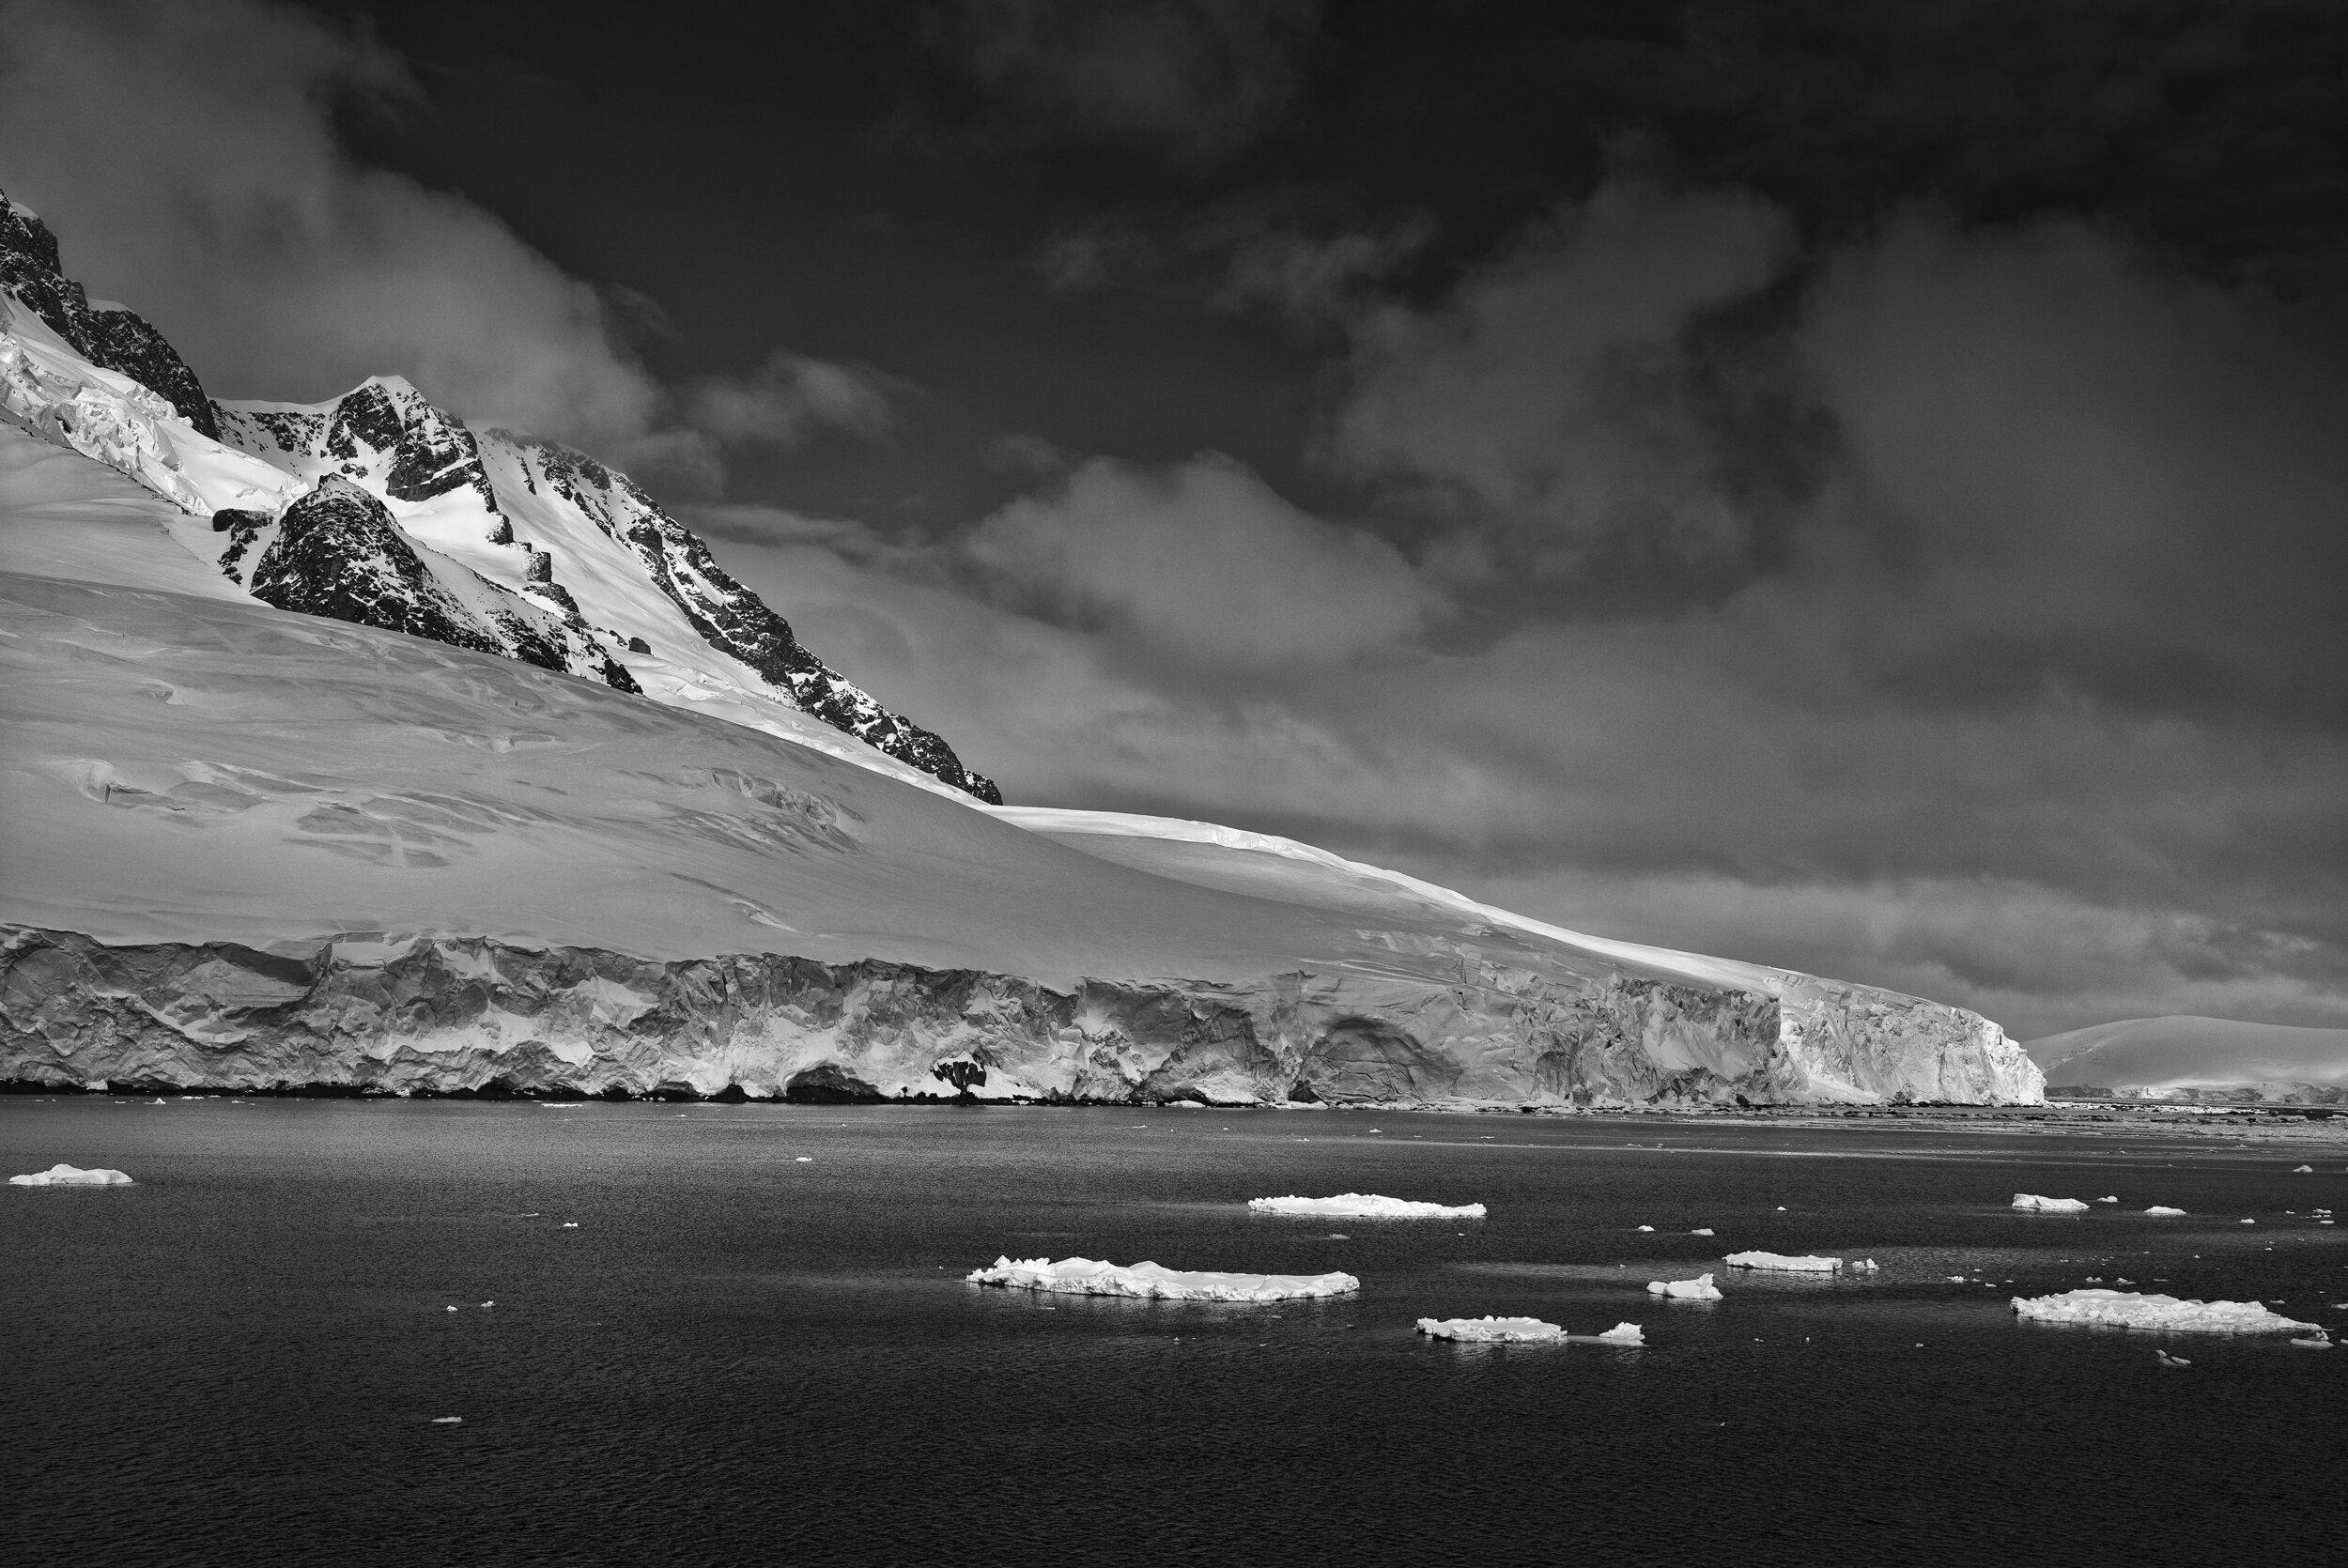 manuel_uebler_antarctica_bw_015.jpg